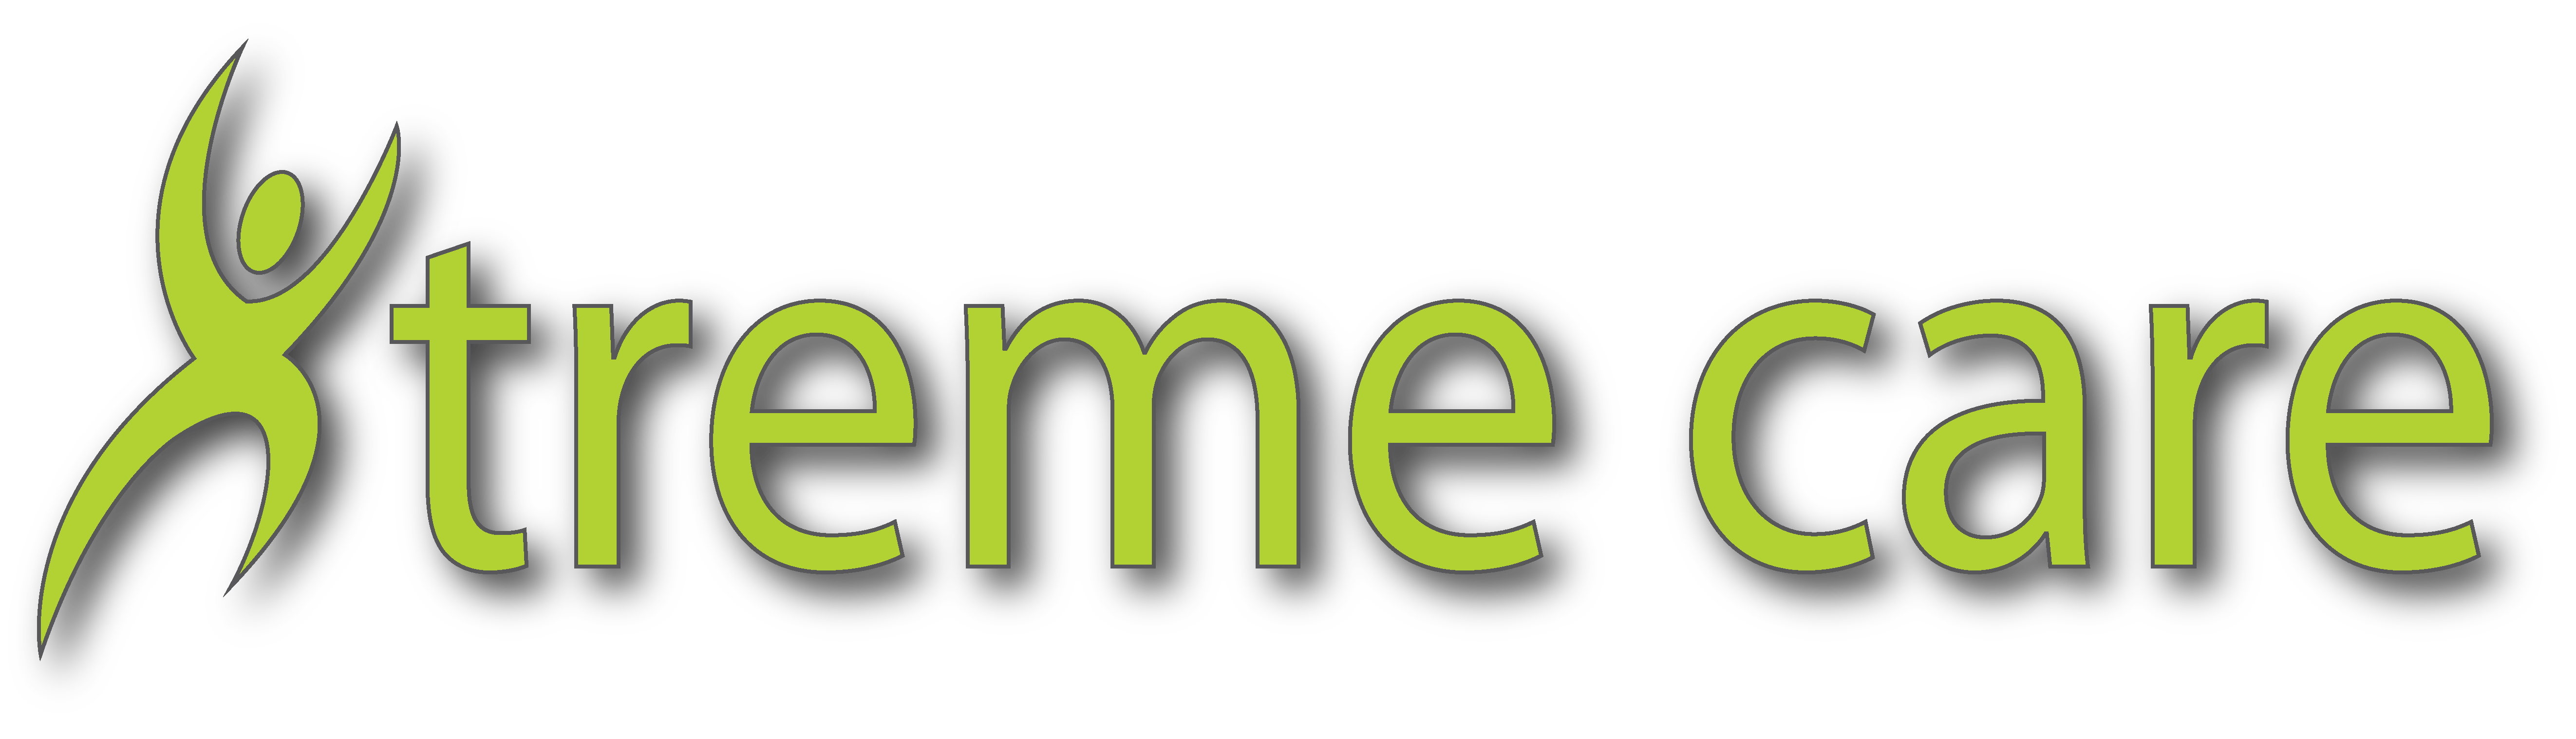 Xtreme Care LLC